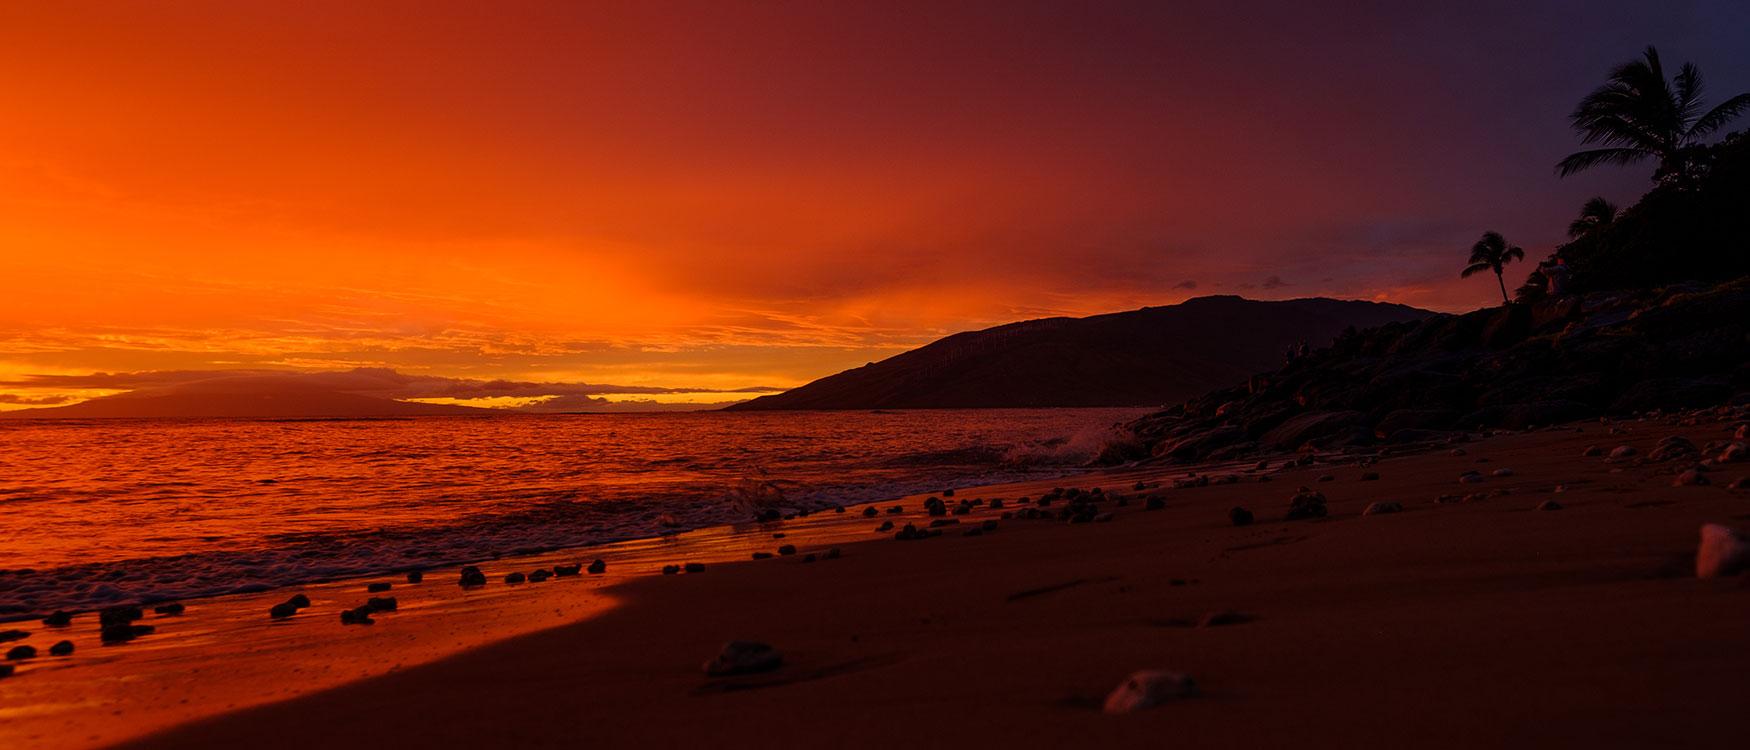 Sonnenuntergang Maui, Hawaii ©Ines Thomsen